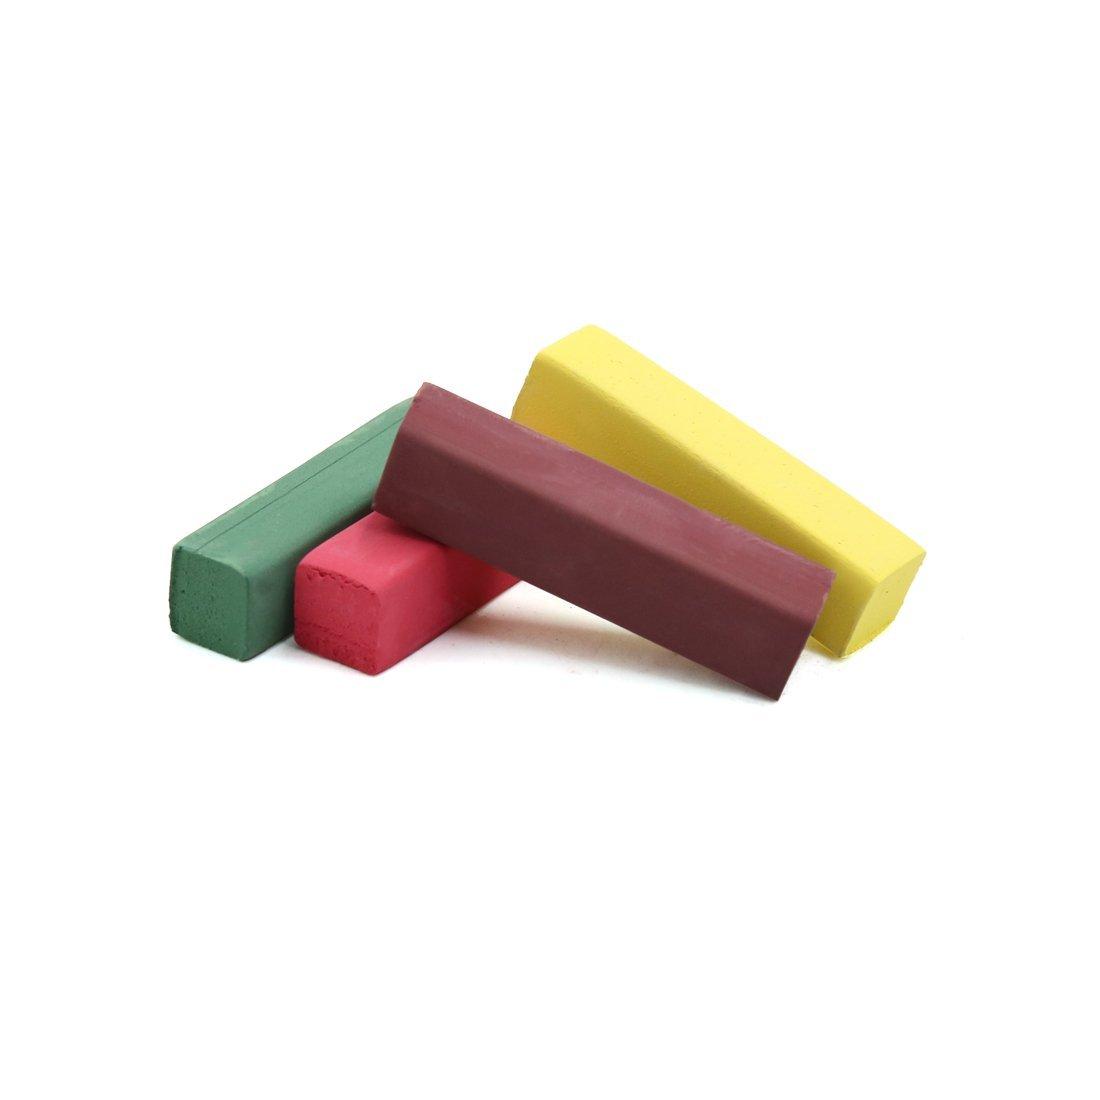 Amazon.com: eDealMax 24pcs 4.2cm Longitud del arco iris de Los Colores DIY Tiza Temporal del Cabello Salon Styling Mujer Tinte: Health & Personal Care